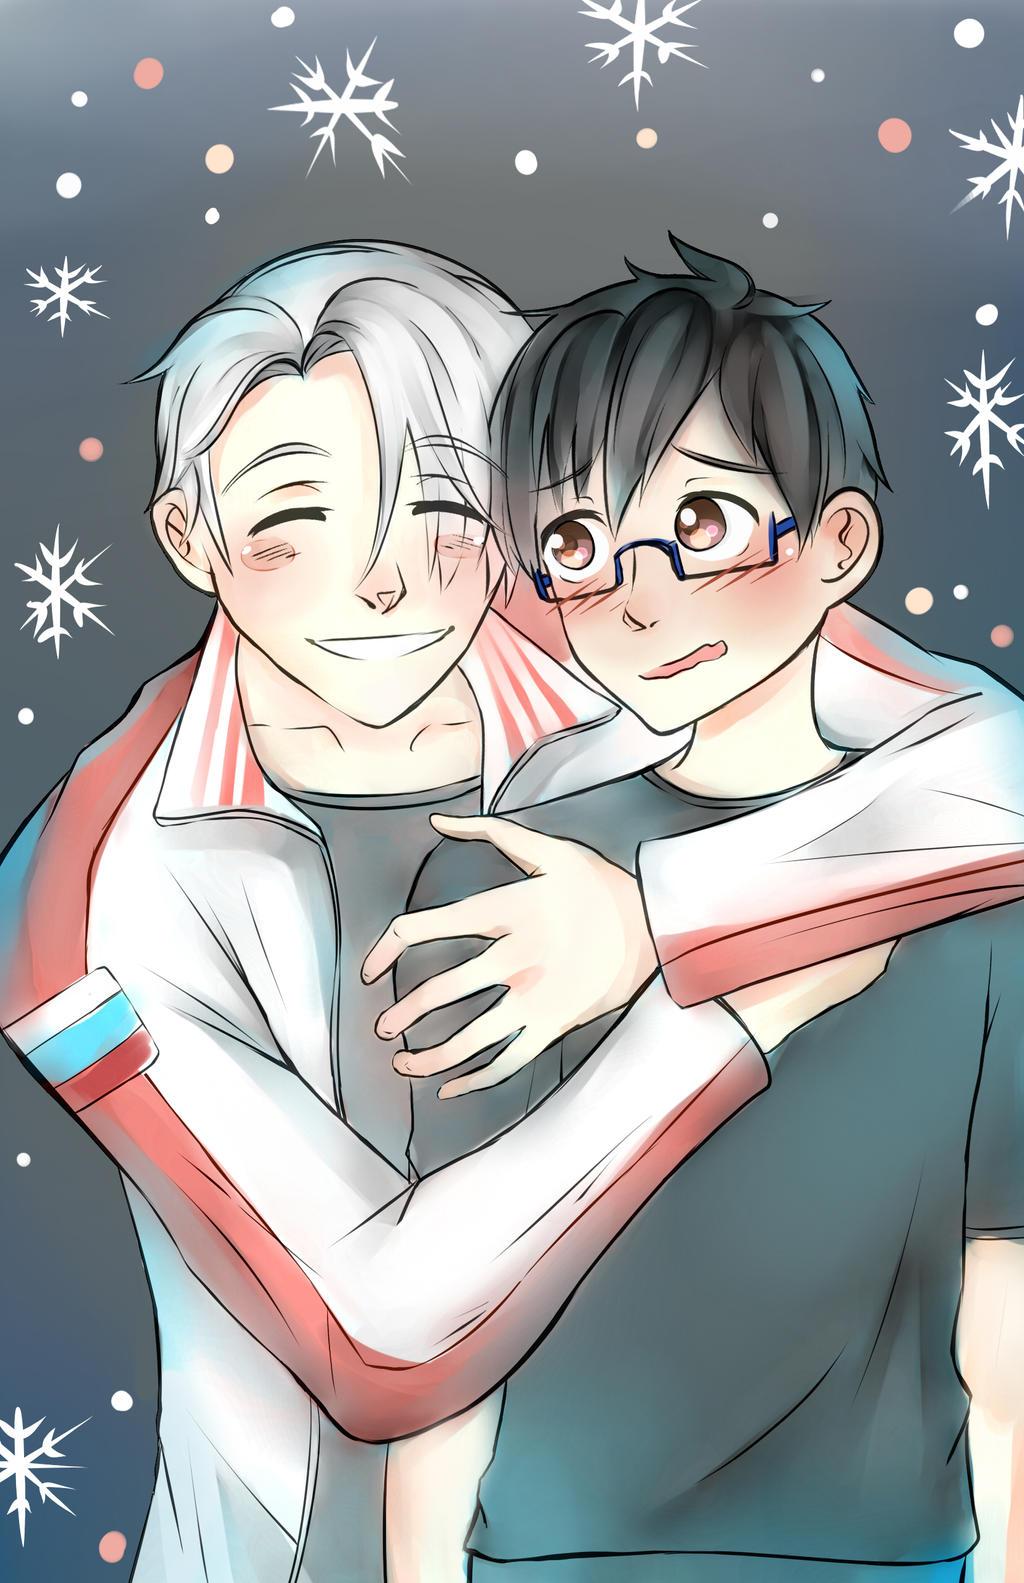 Yuri and Victor by Nokami-san